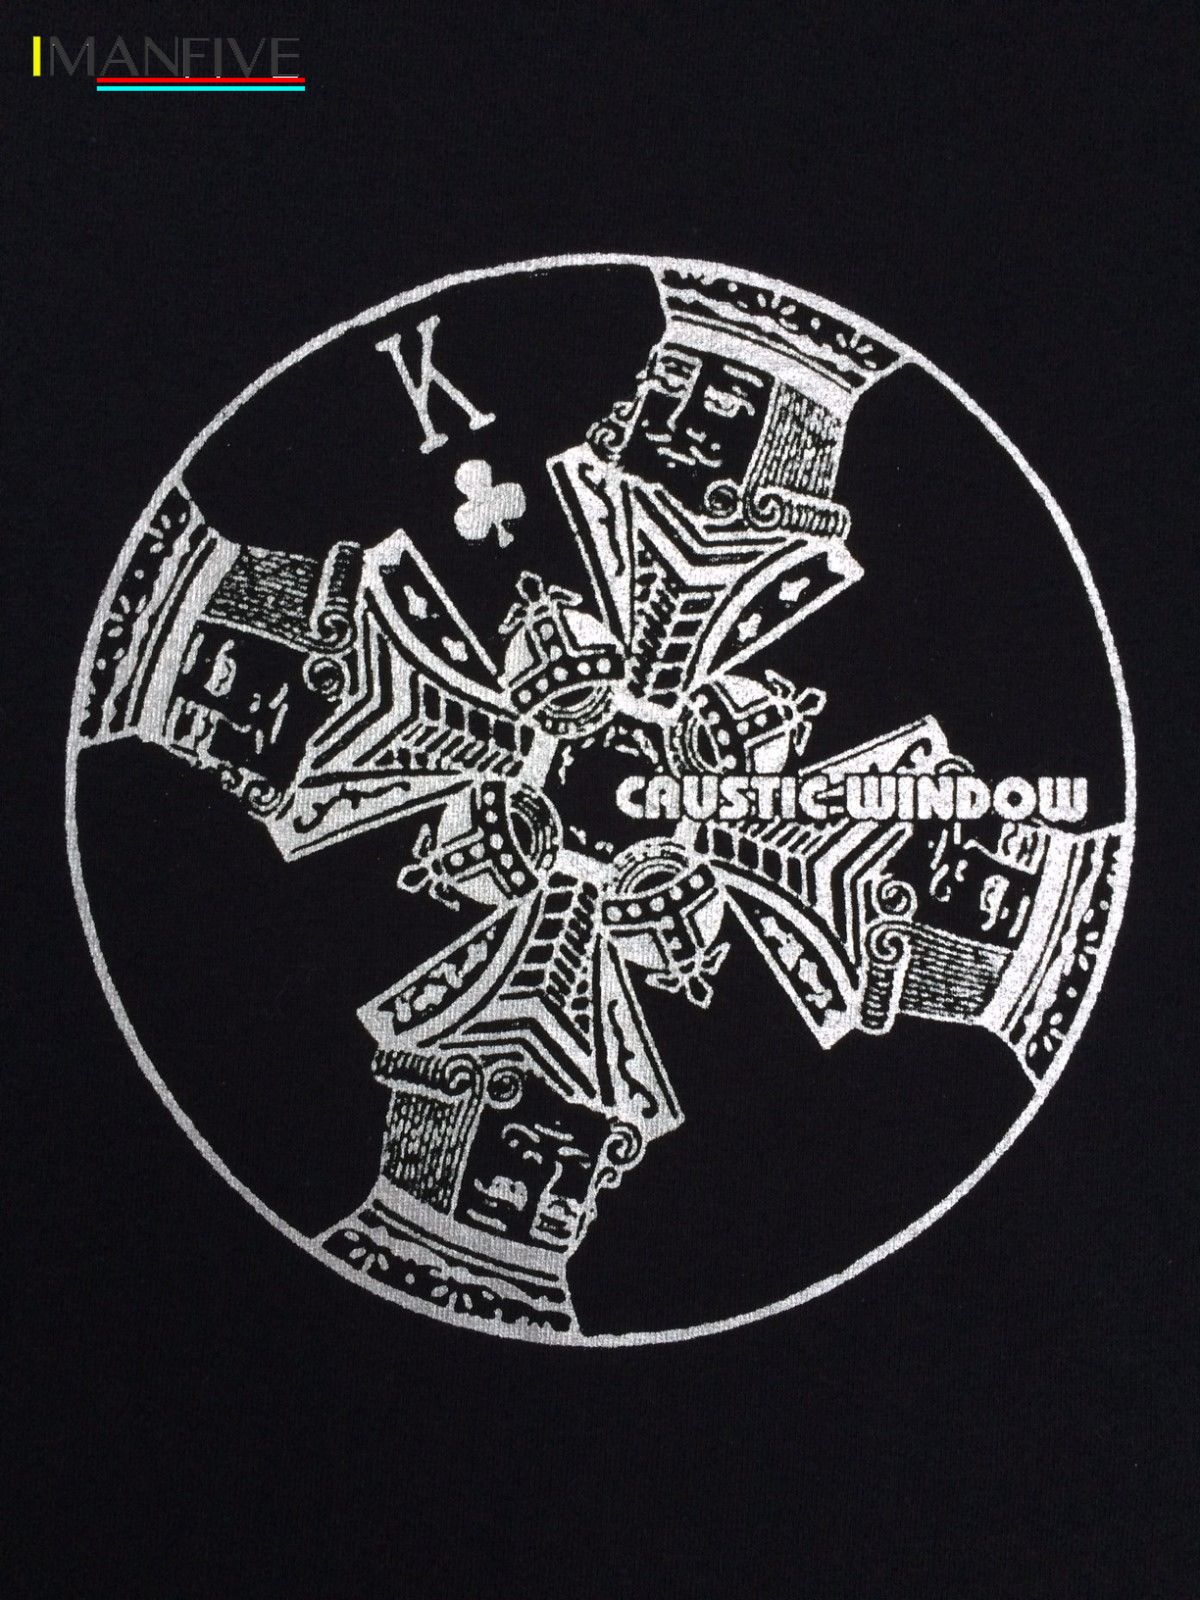 CAUSTIC WINDOW T SHIRT APHEX TWIN REPHLEX JOYREX ACID UK TECHNO BLACK DOG ETC in T Shirts from Men 39 s Clothing